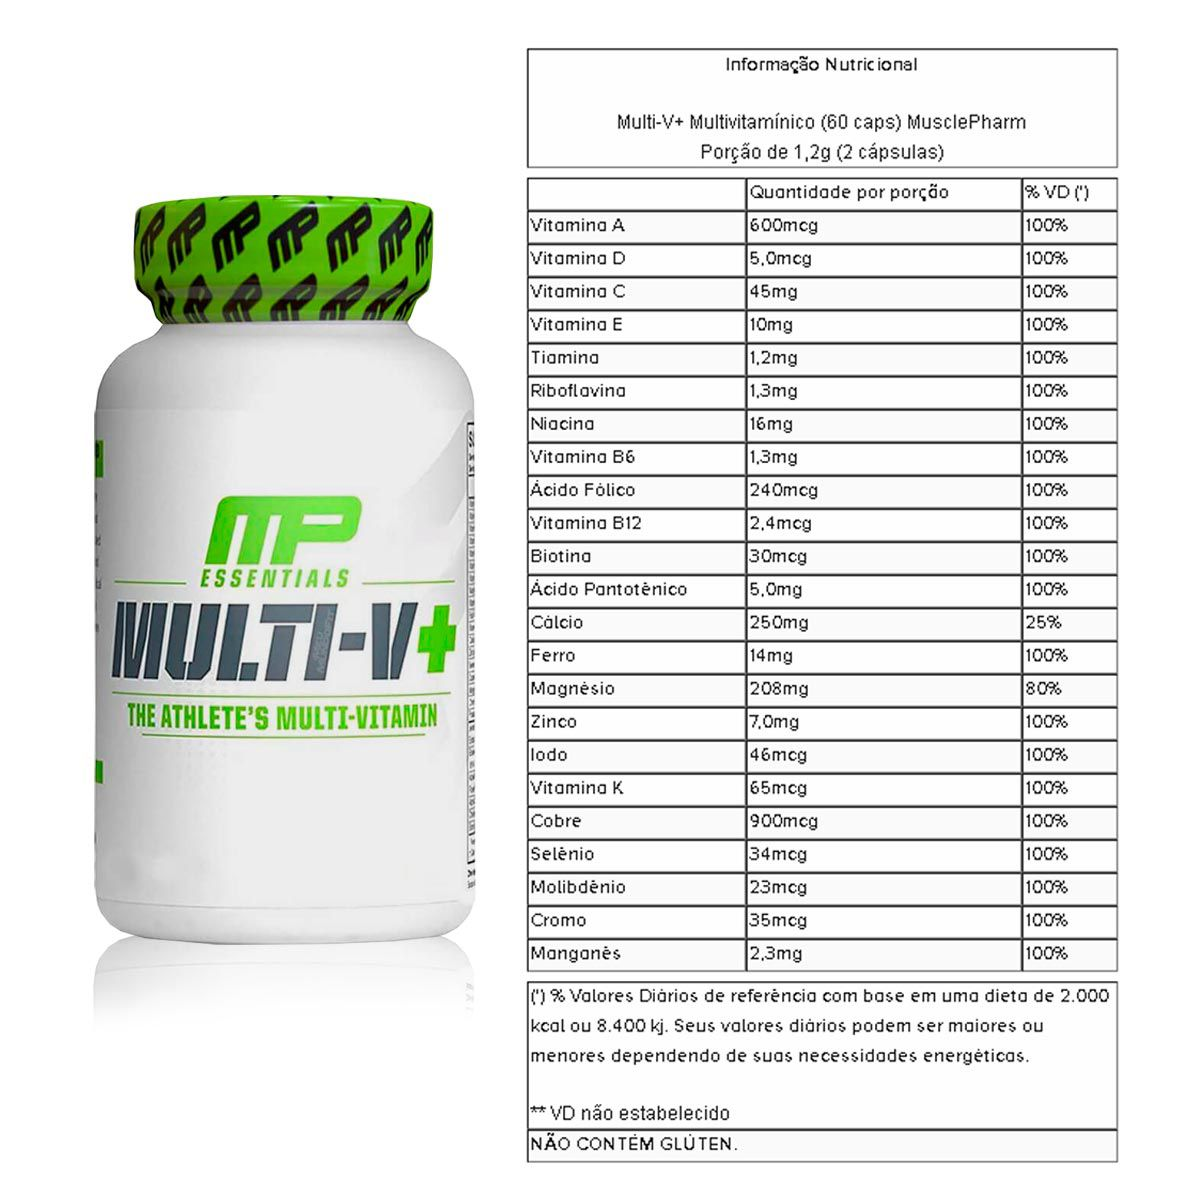 Kit BCAA 240 Cápsulas + Mult-V Multivitaminico 60 Cápsulas + Coqueteleira - Muscle Pharm